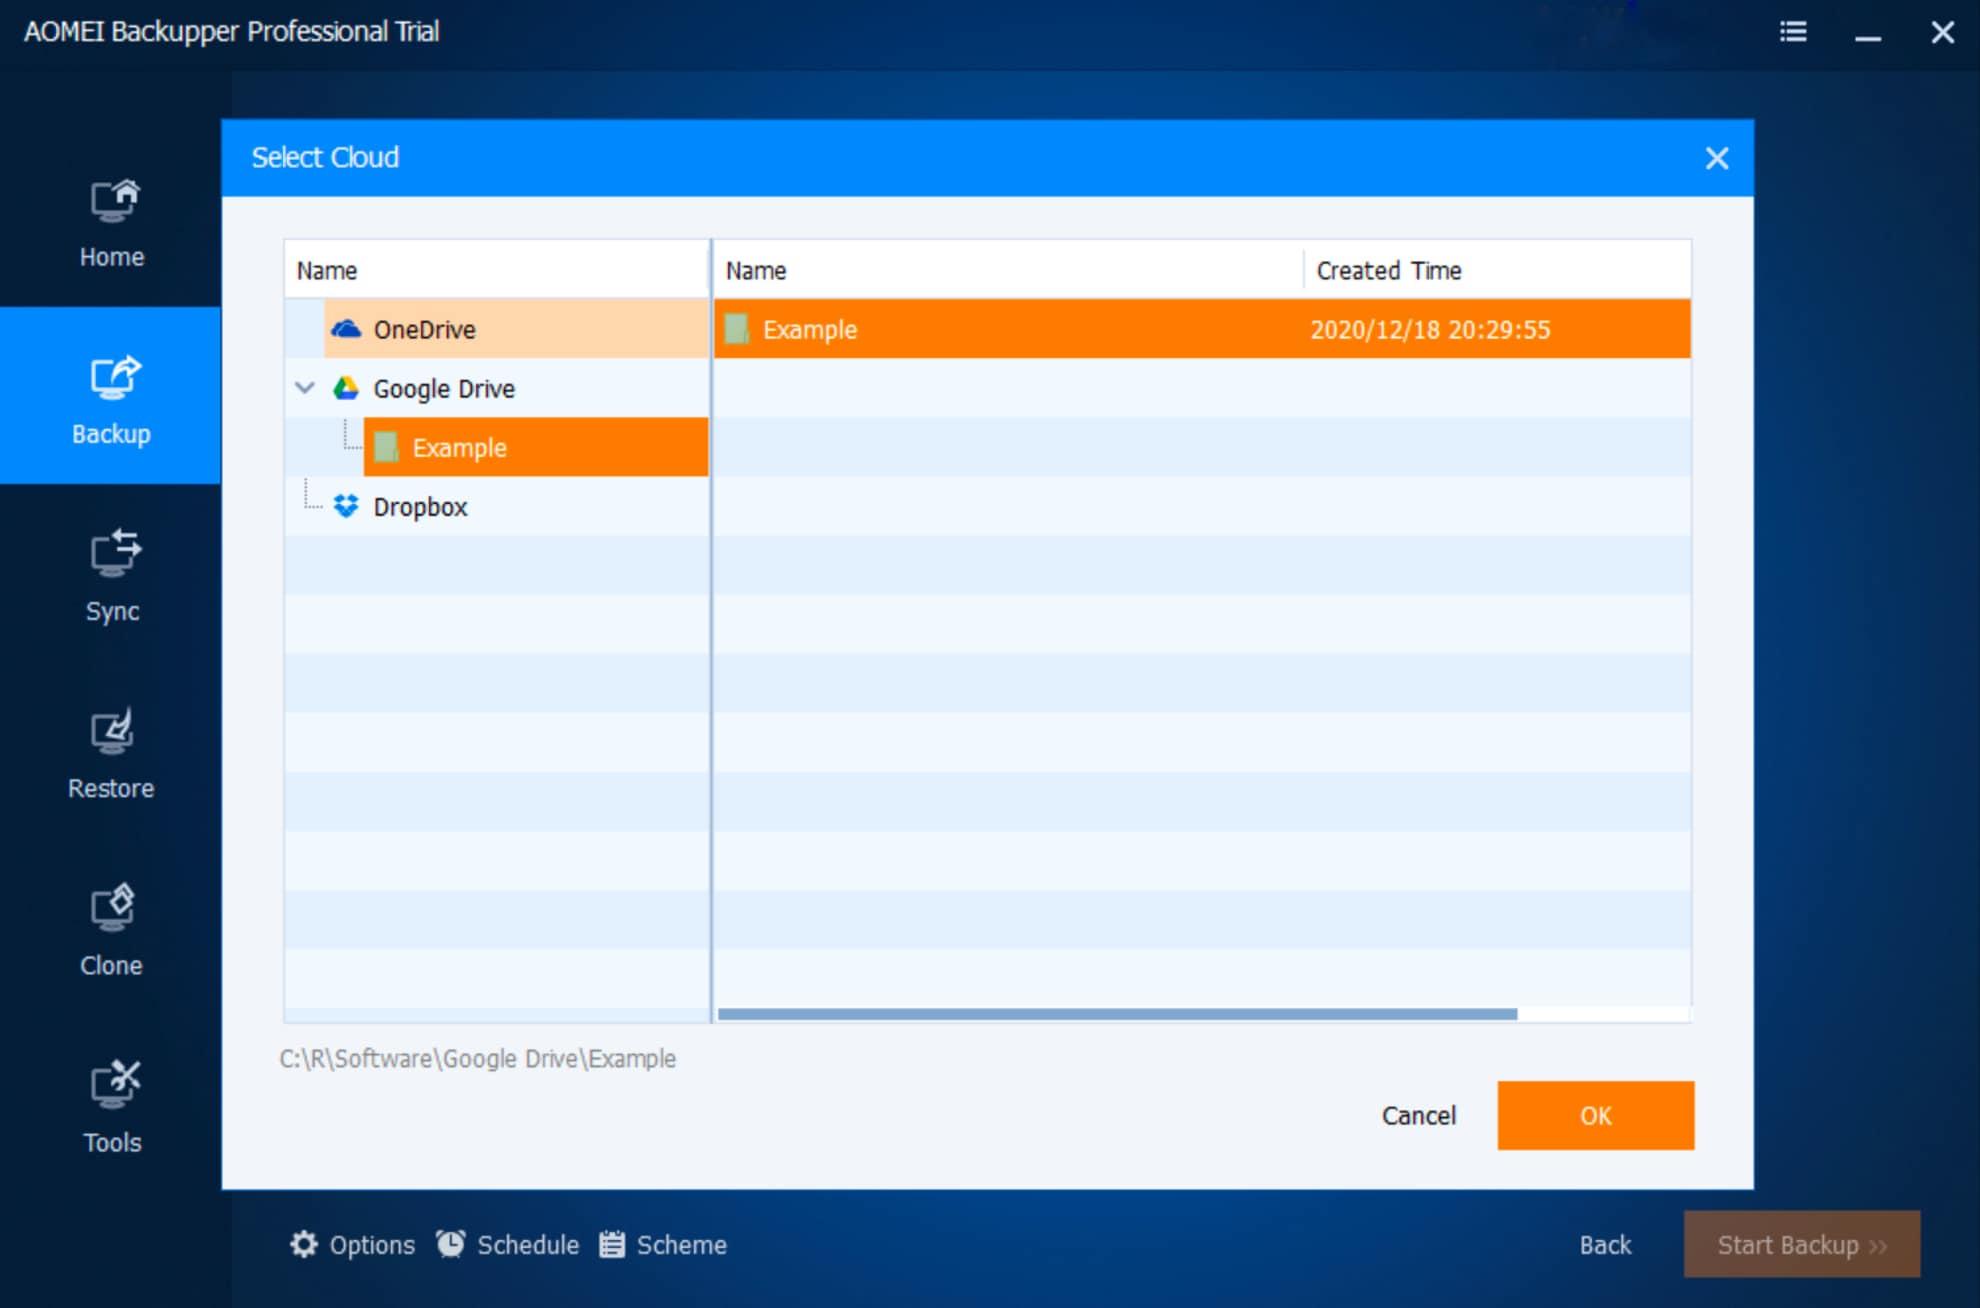 Select a Cloud Drive Type